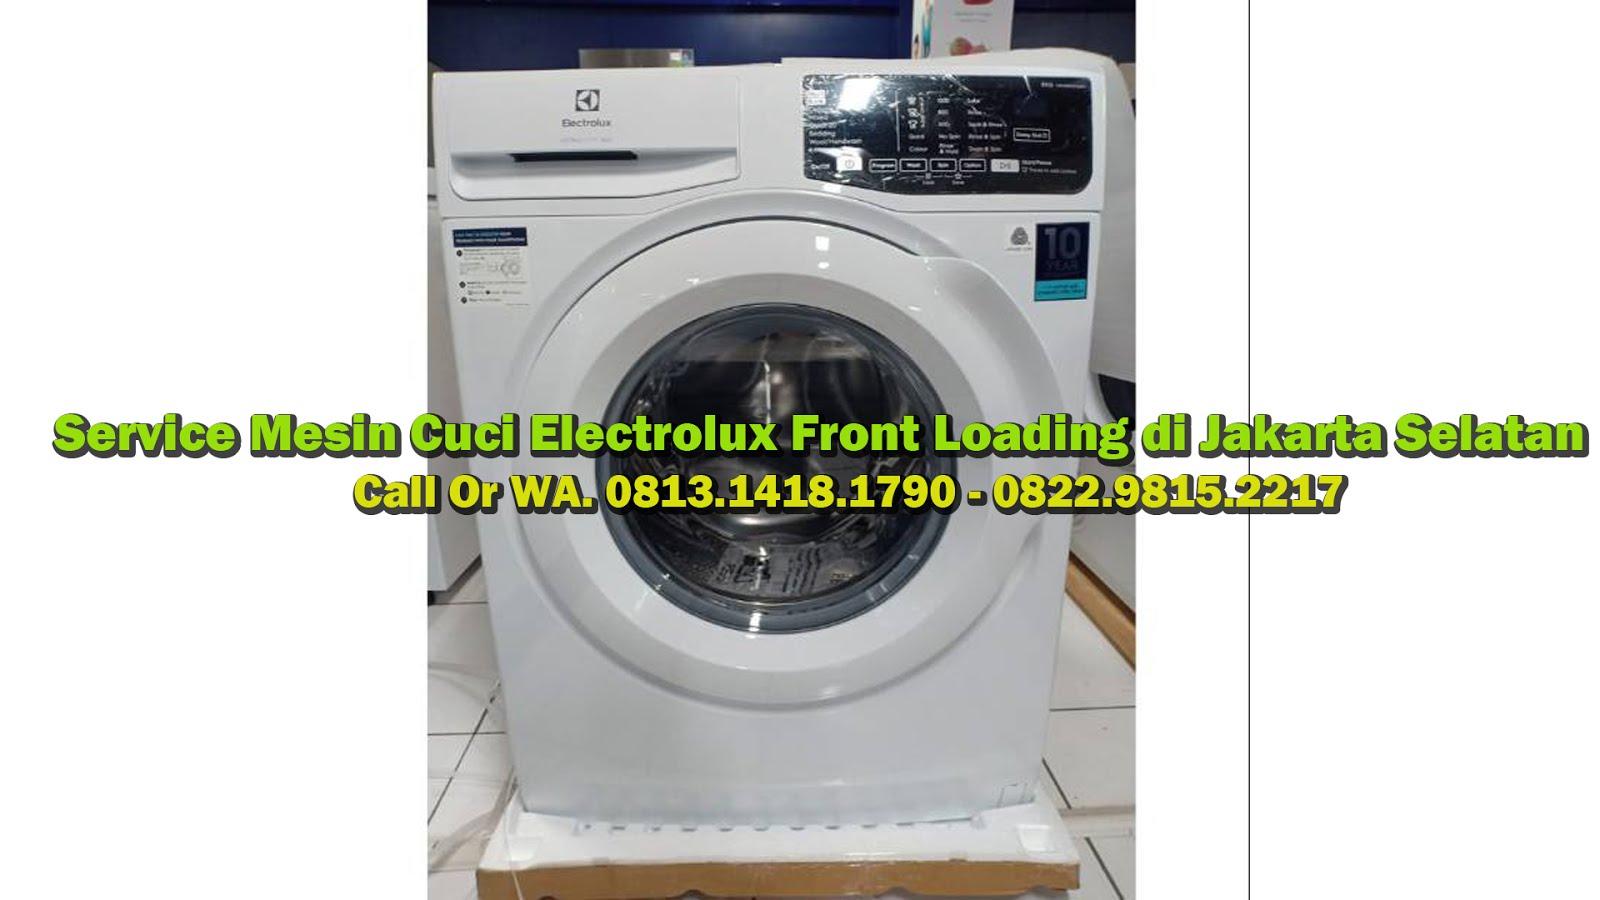 Service Mesin Cuci Electrolux di Jakarta Selatan